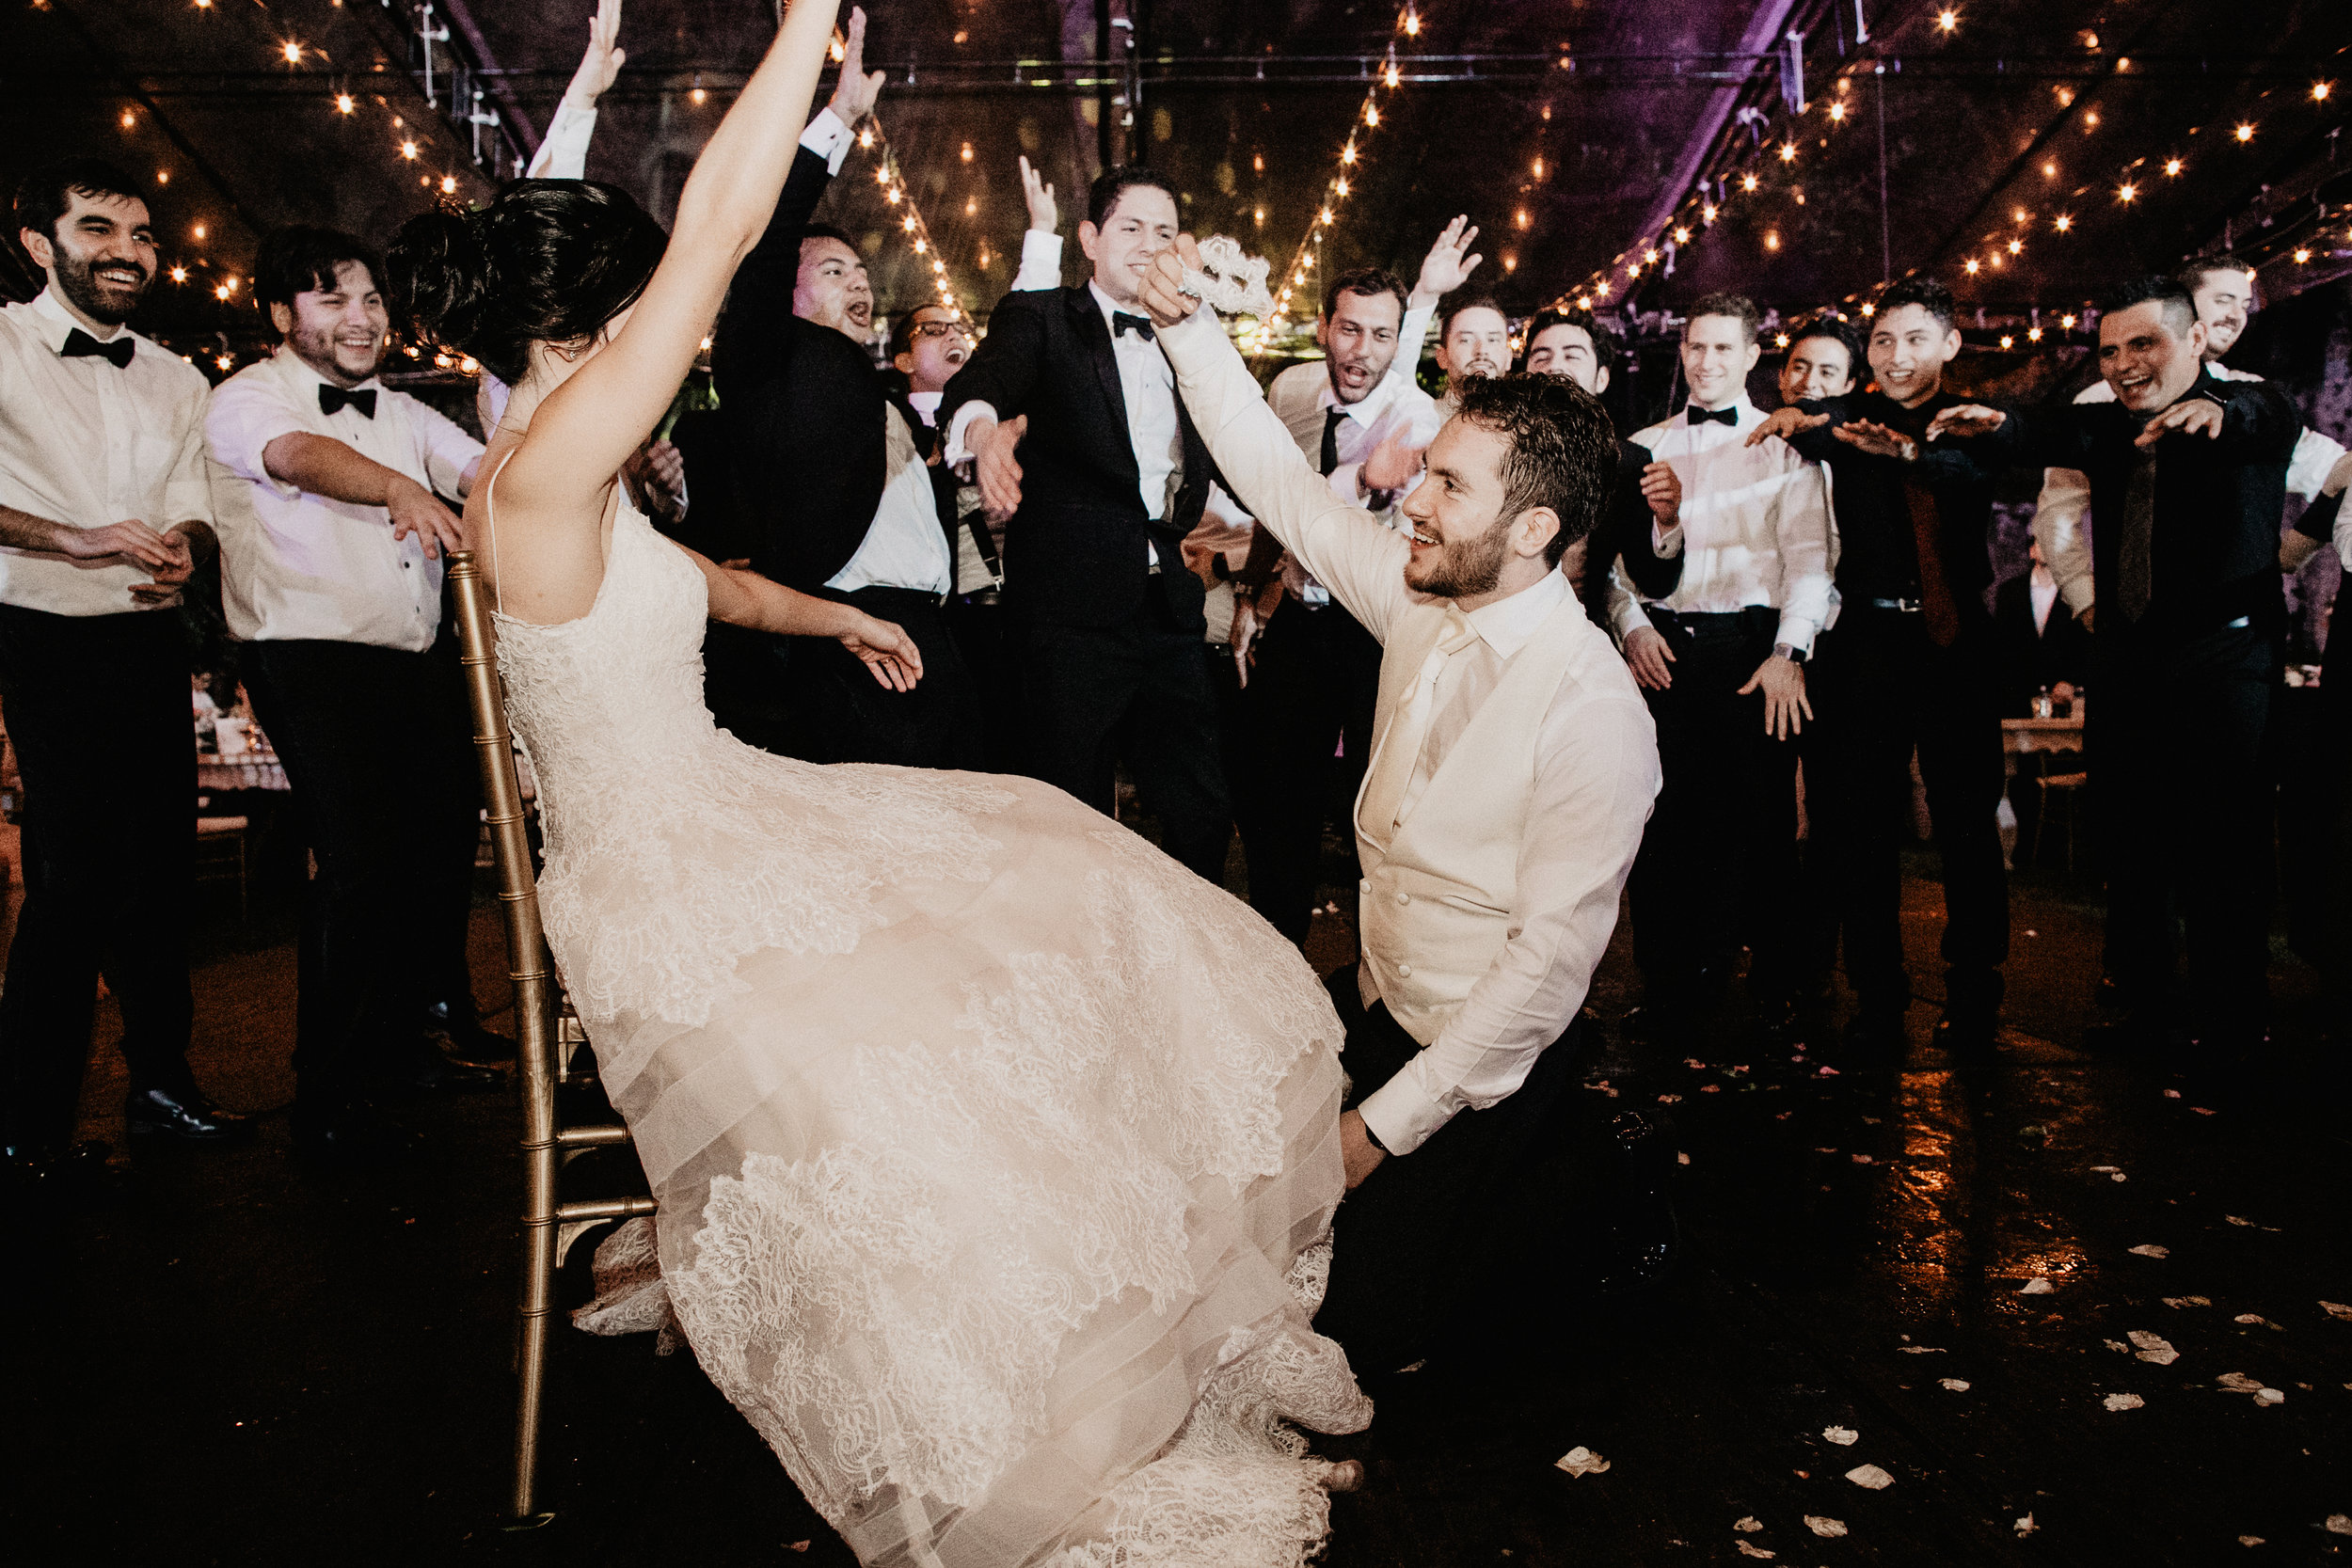 Alfonso_flores_destination_wedding_photography_vanesa_carlos-1243.JPG